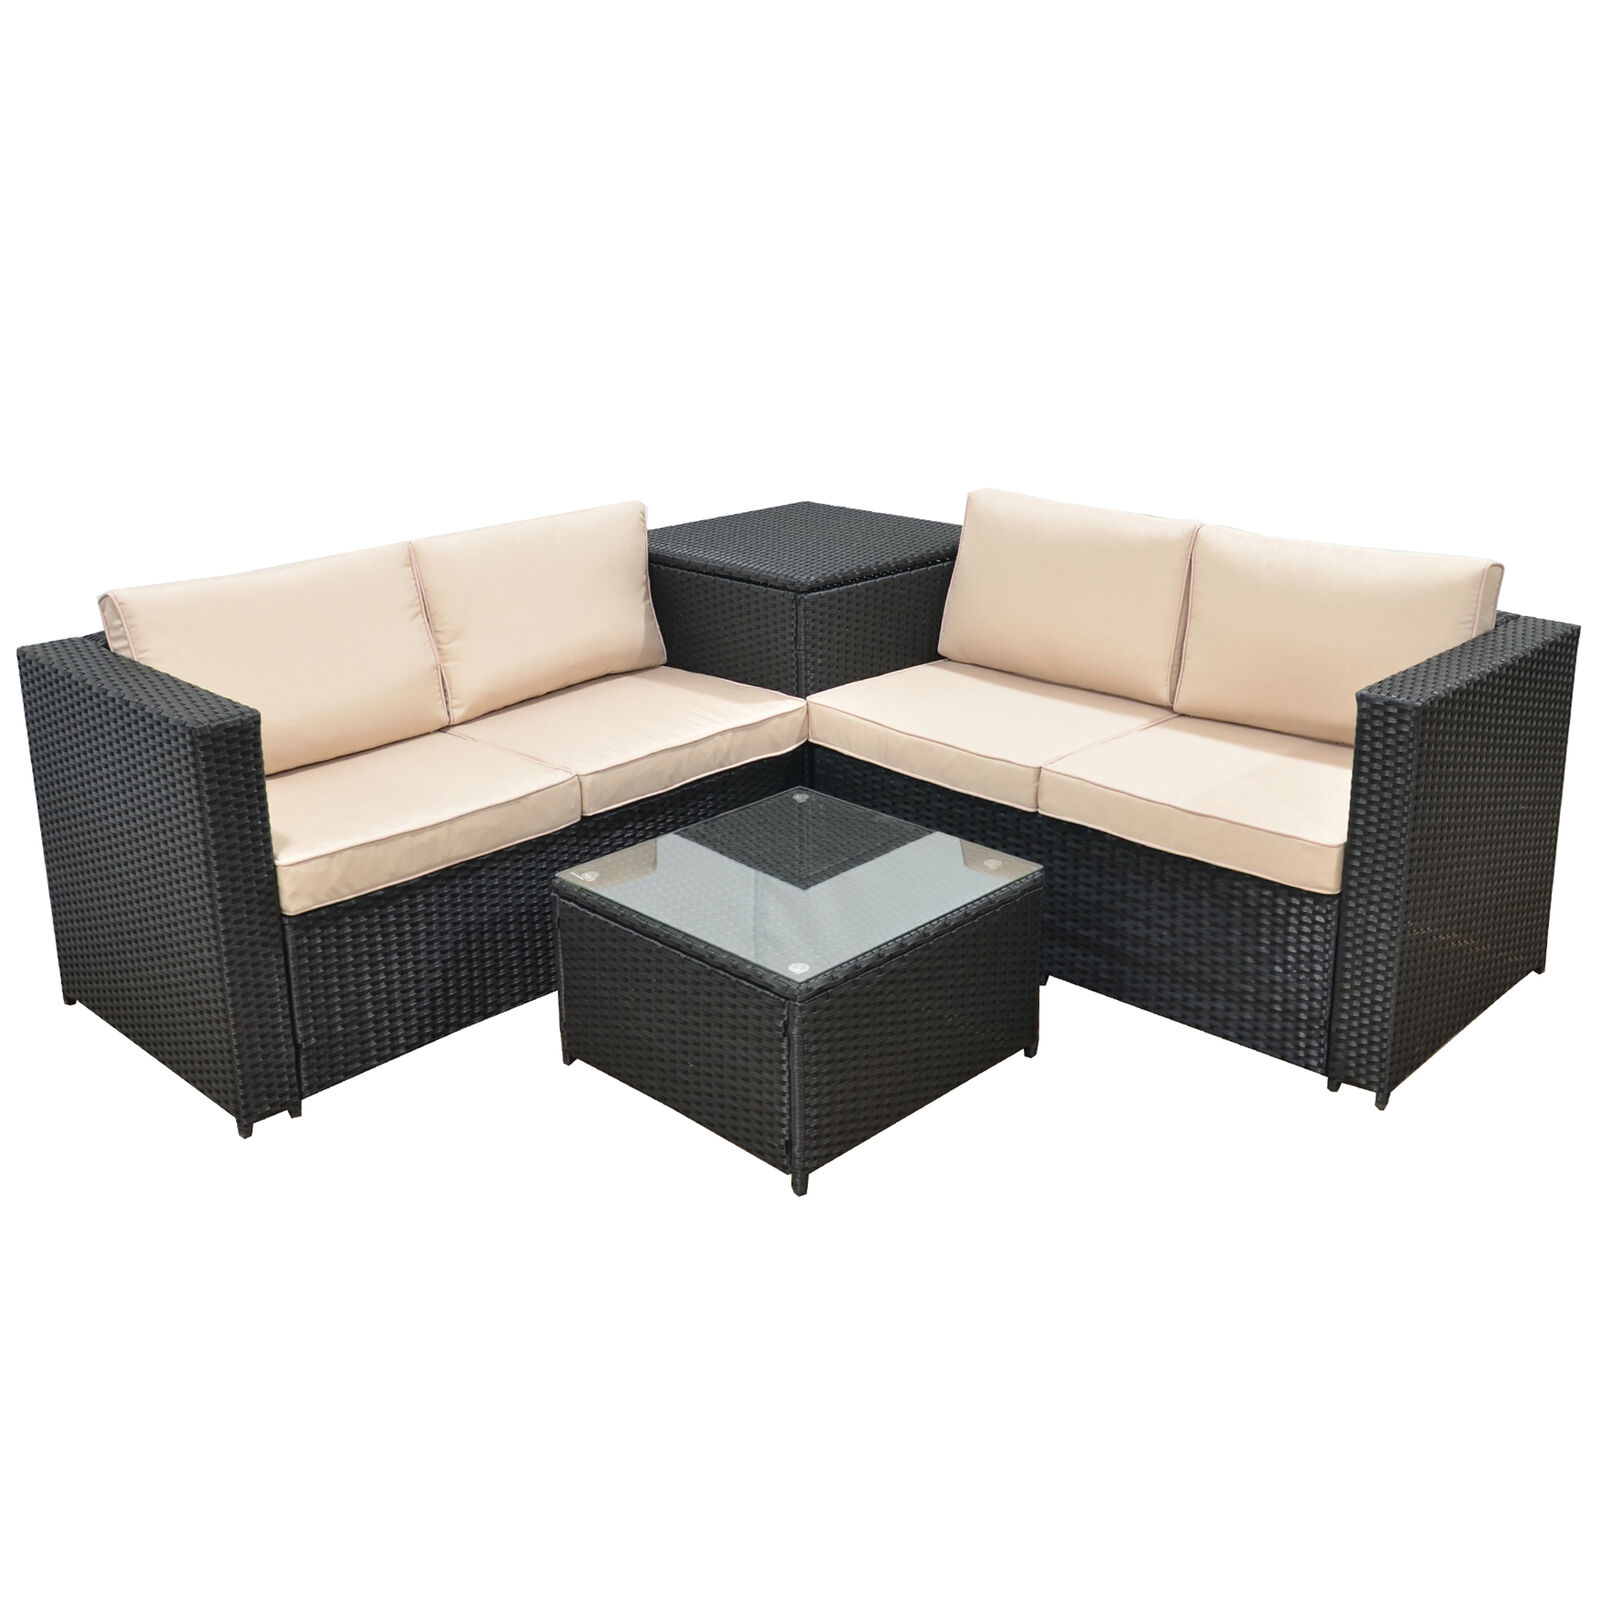 Jalano Poly Rattan Lounge Set SM1 Gartenmöbel Gartengarnitur Möbel anthrazit